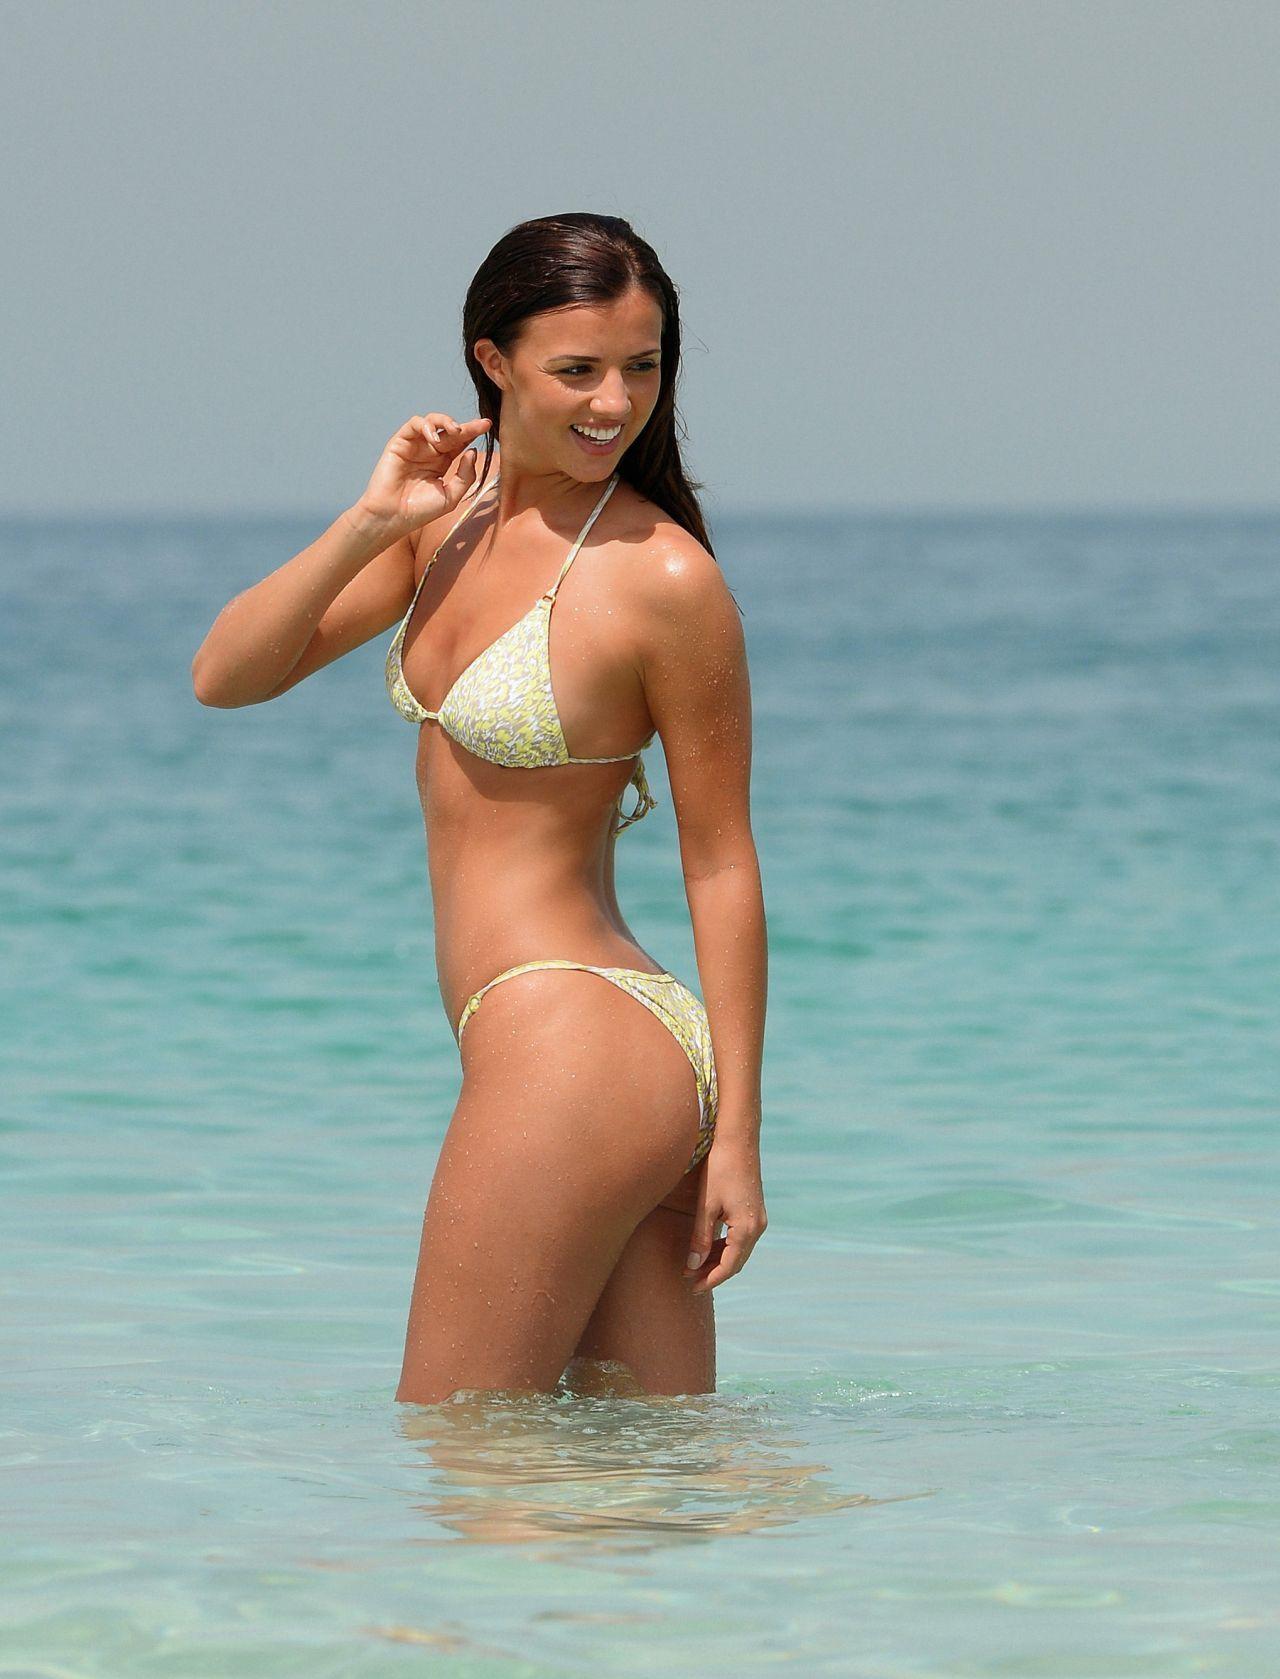 Lucy Mecklenburgh Bikini Hot Pics Dubai April 2015 3 Jpg